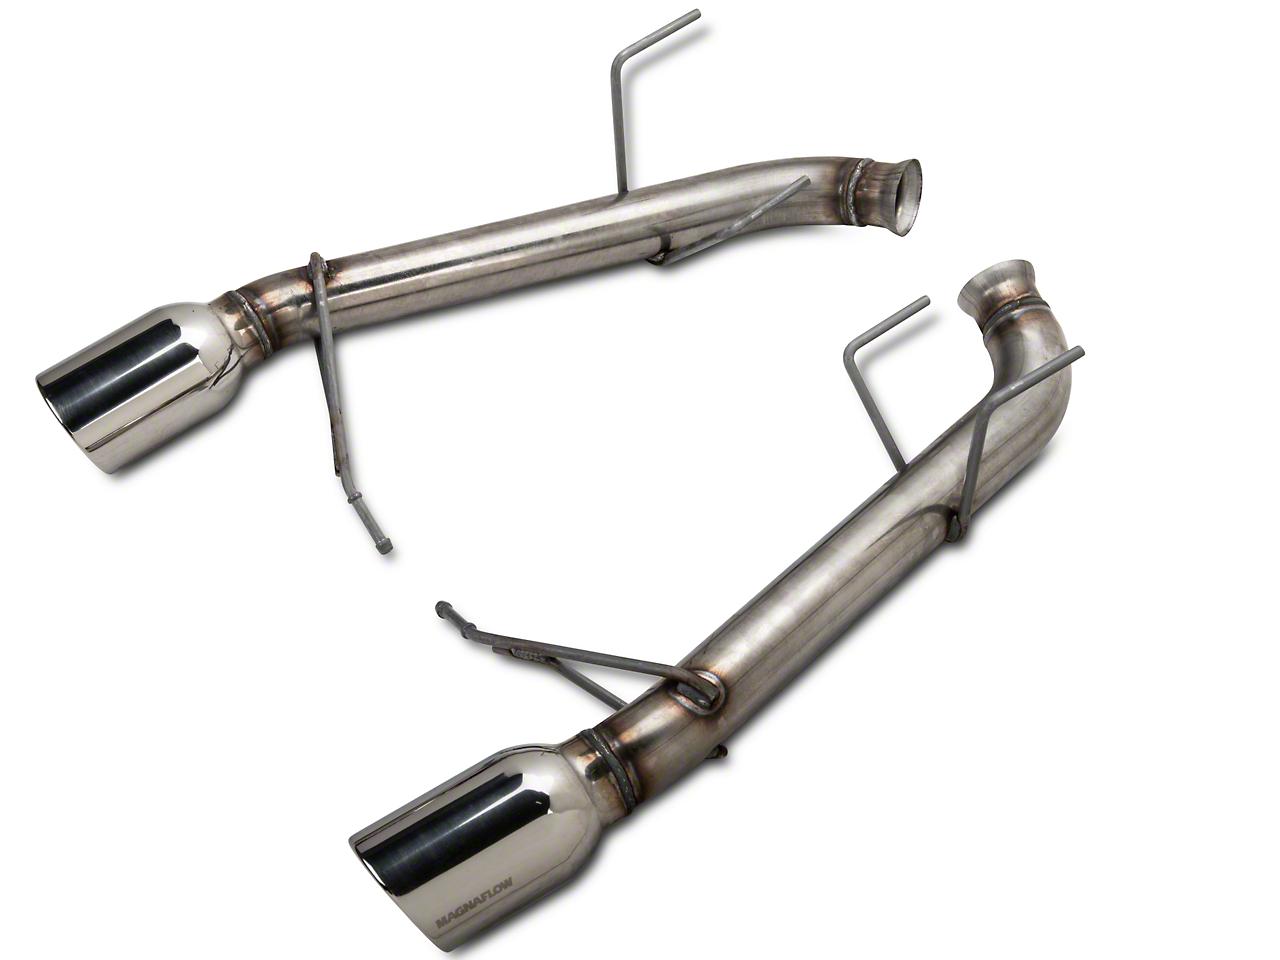 Magnaflow Race Series Axle-Back Exhaust (11-14 V6)